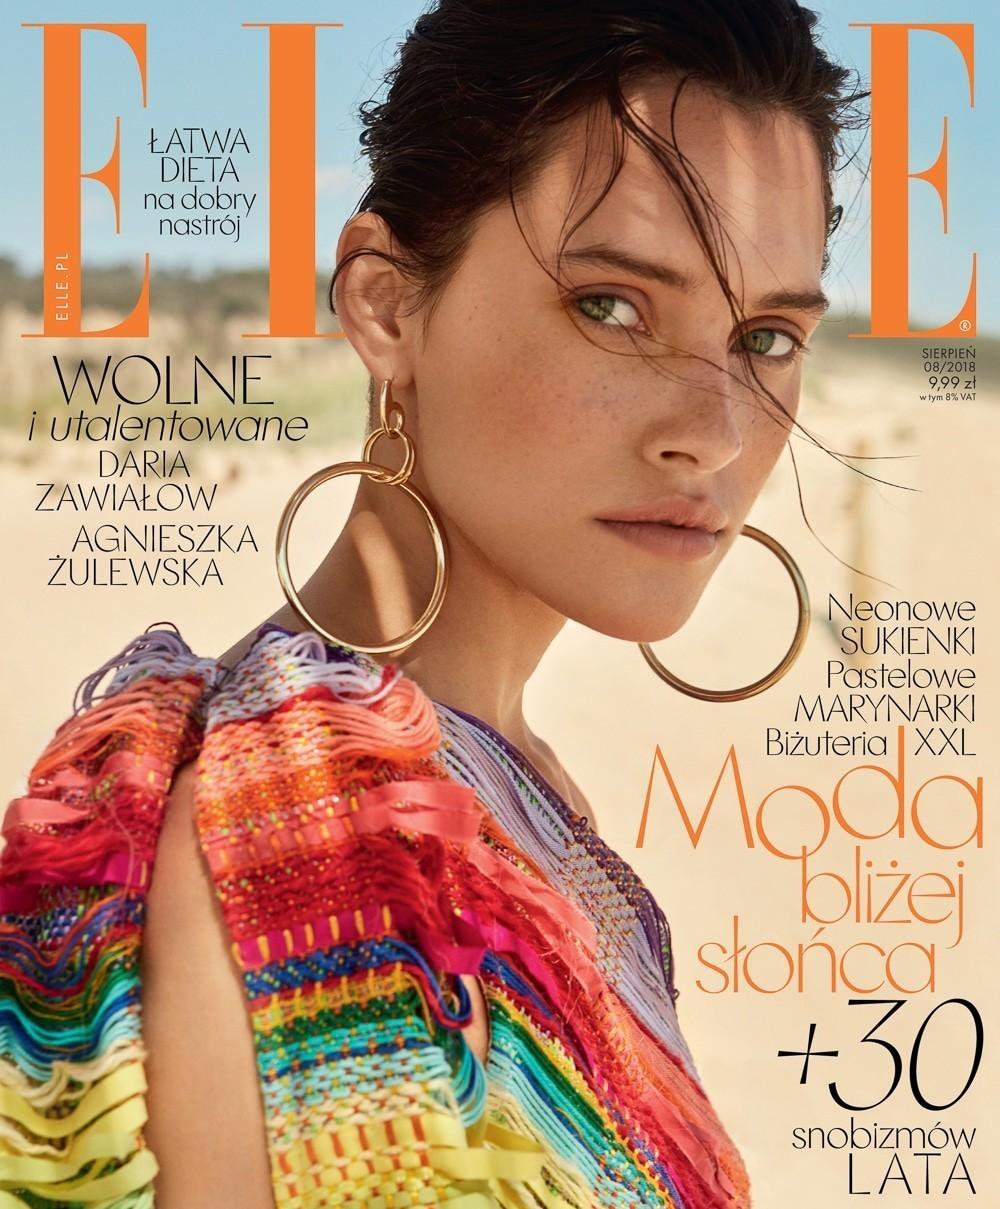 《ELLE》 杂志波兰版 8月刊时尚大片 沙滩上的一抹彩色 时尚图库 第1张